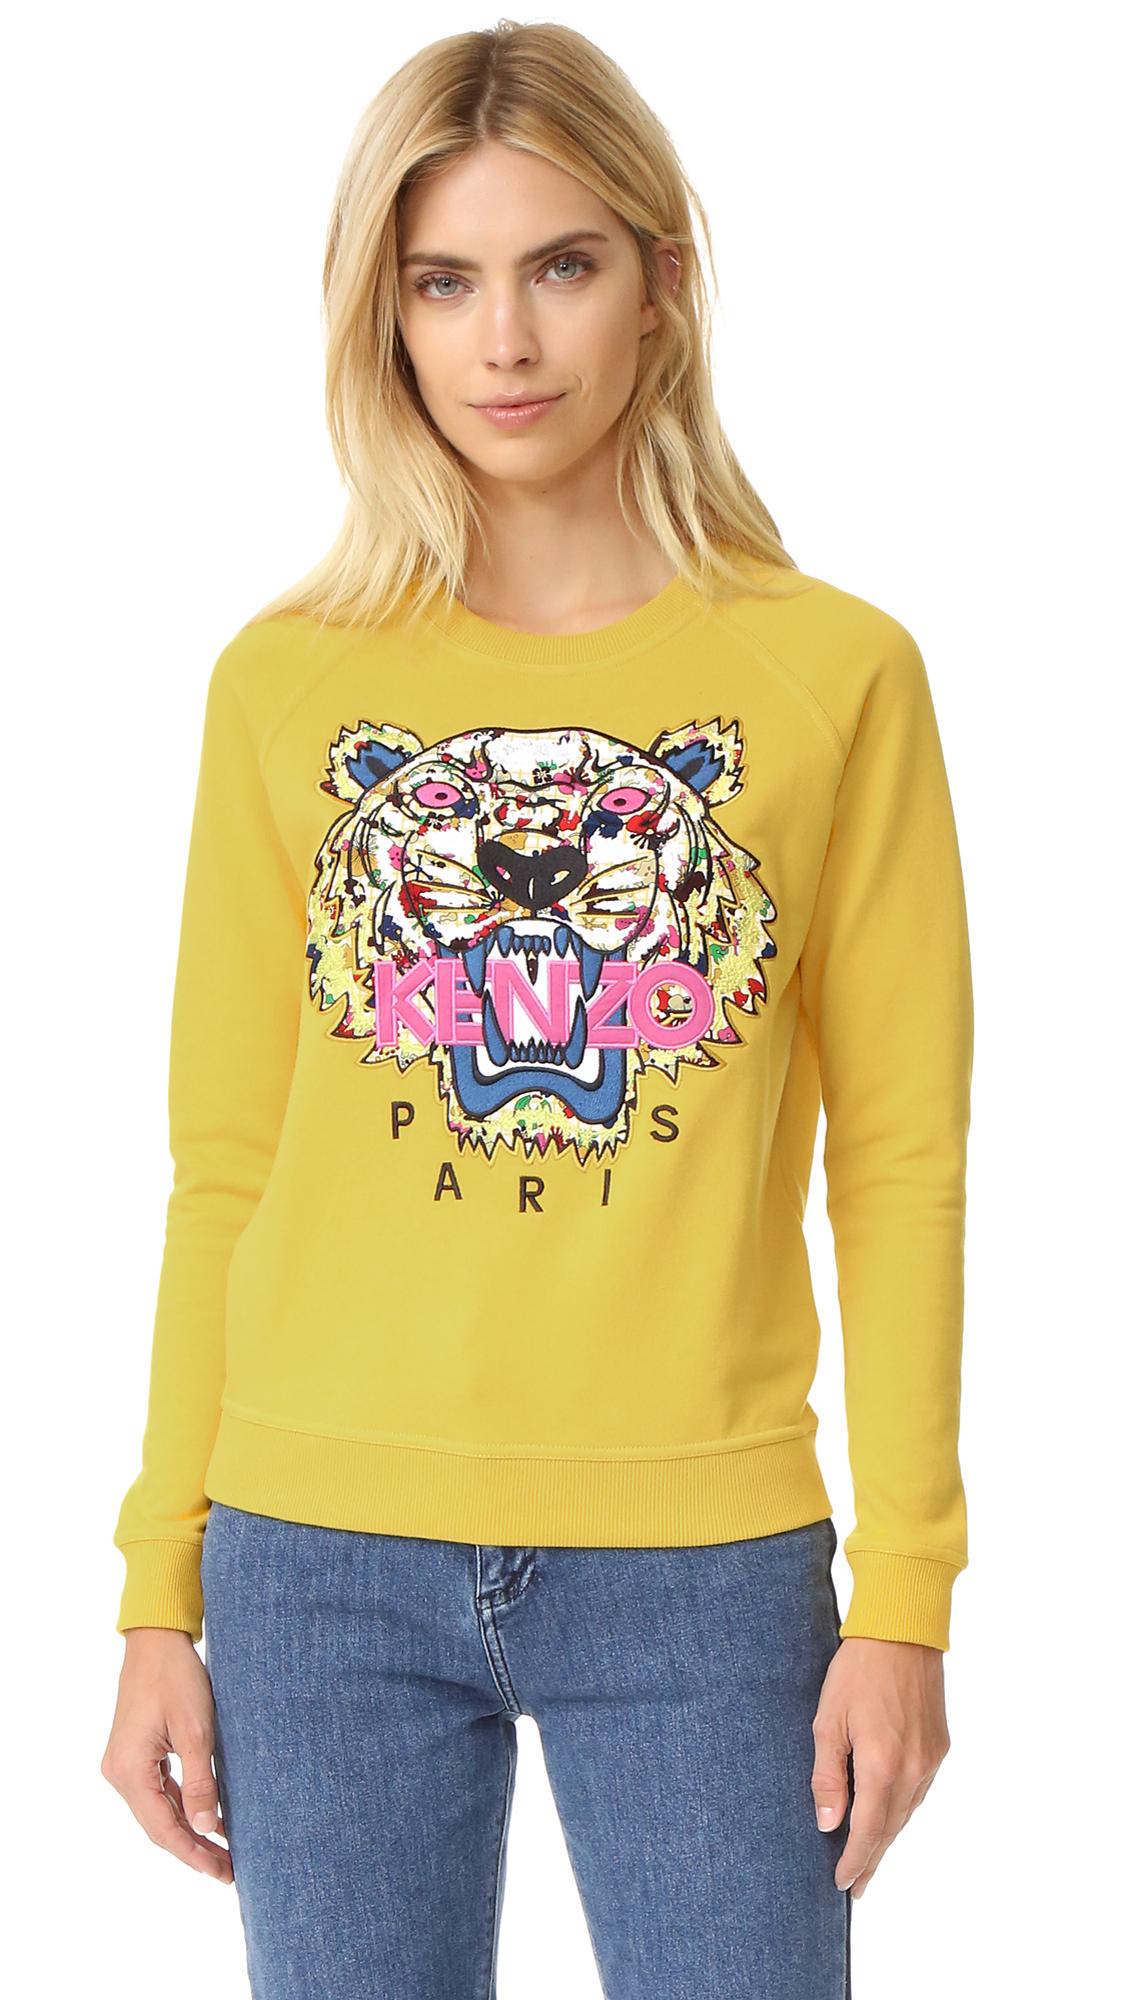 yellow kenzo sweater sale   OFF51% Discounts cfce1c7dc4